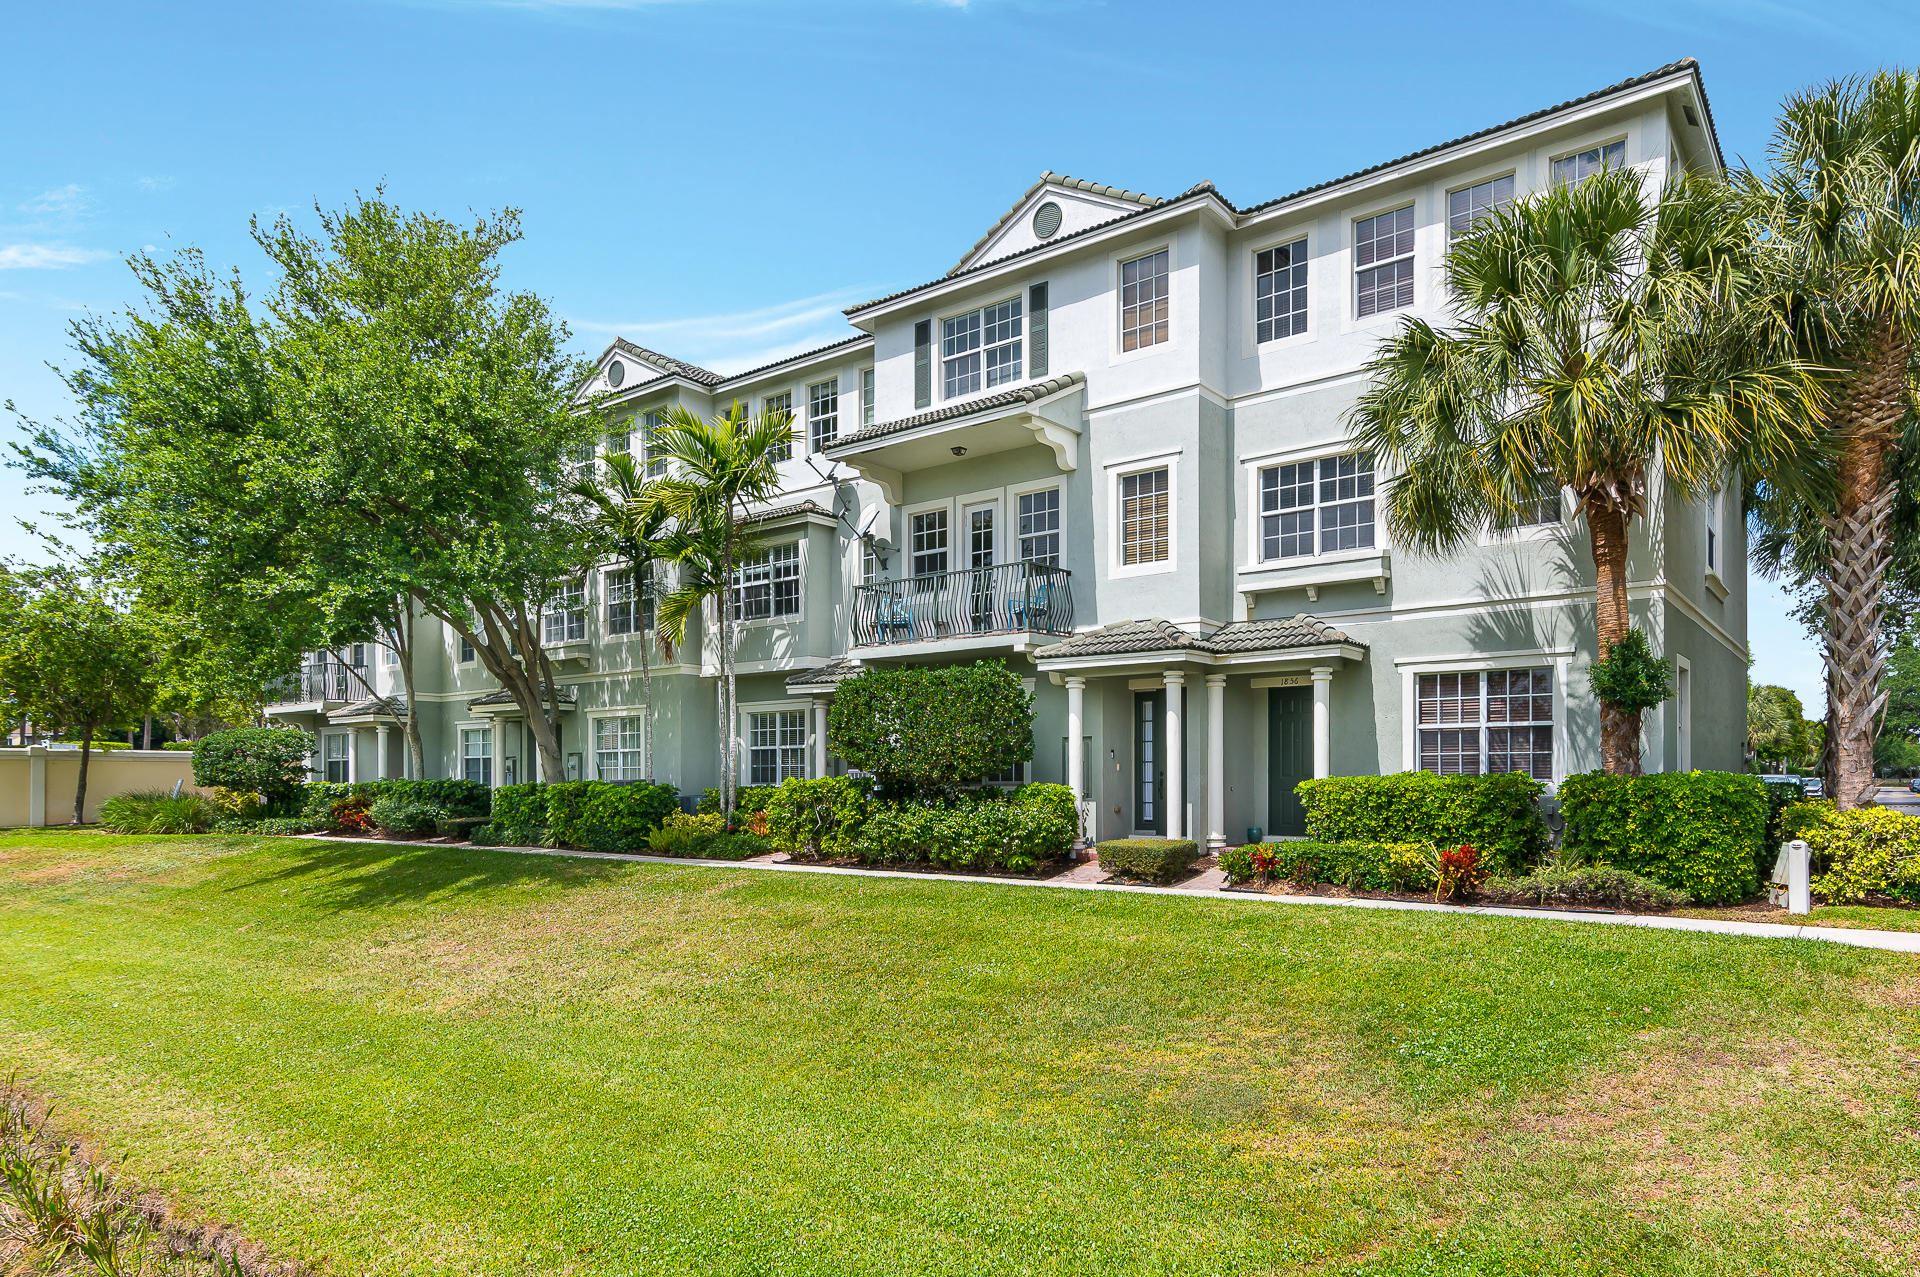 1862 NW 9th Street, Boca Raton, FL 33486 - MLS#: RX-10701699